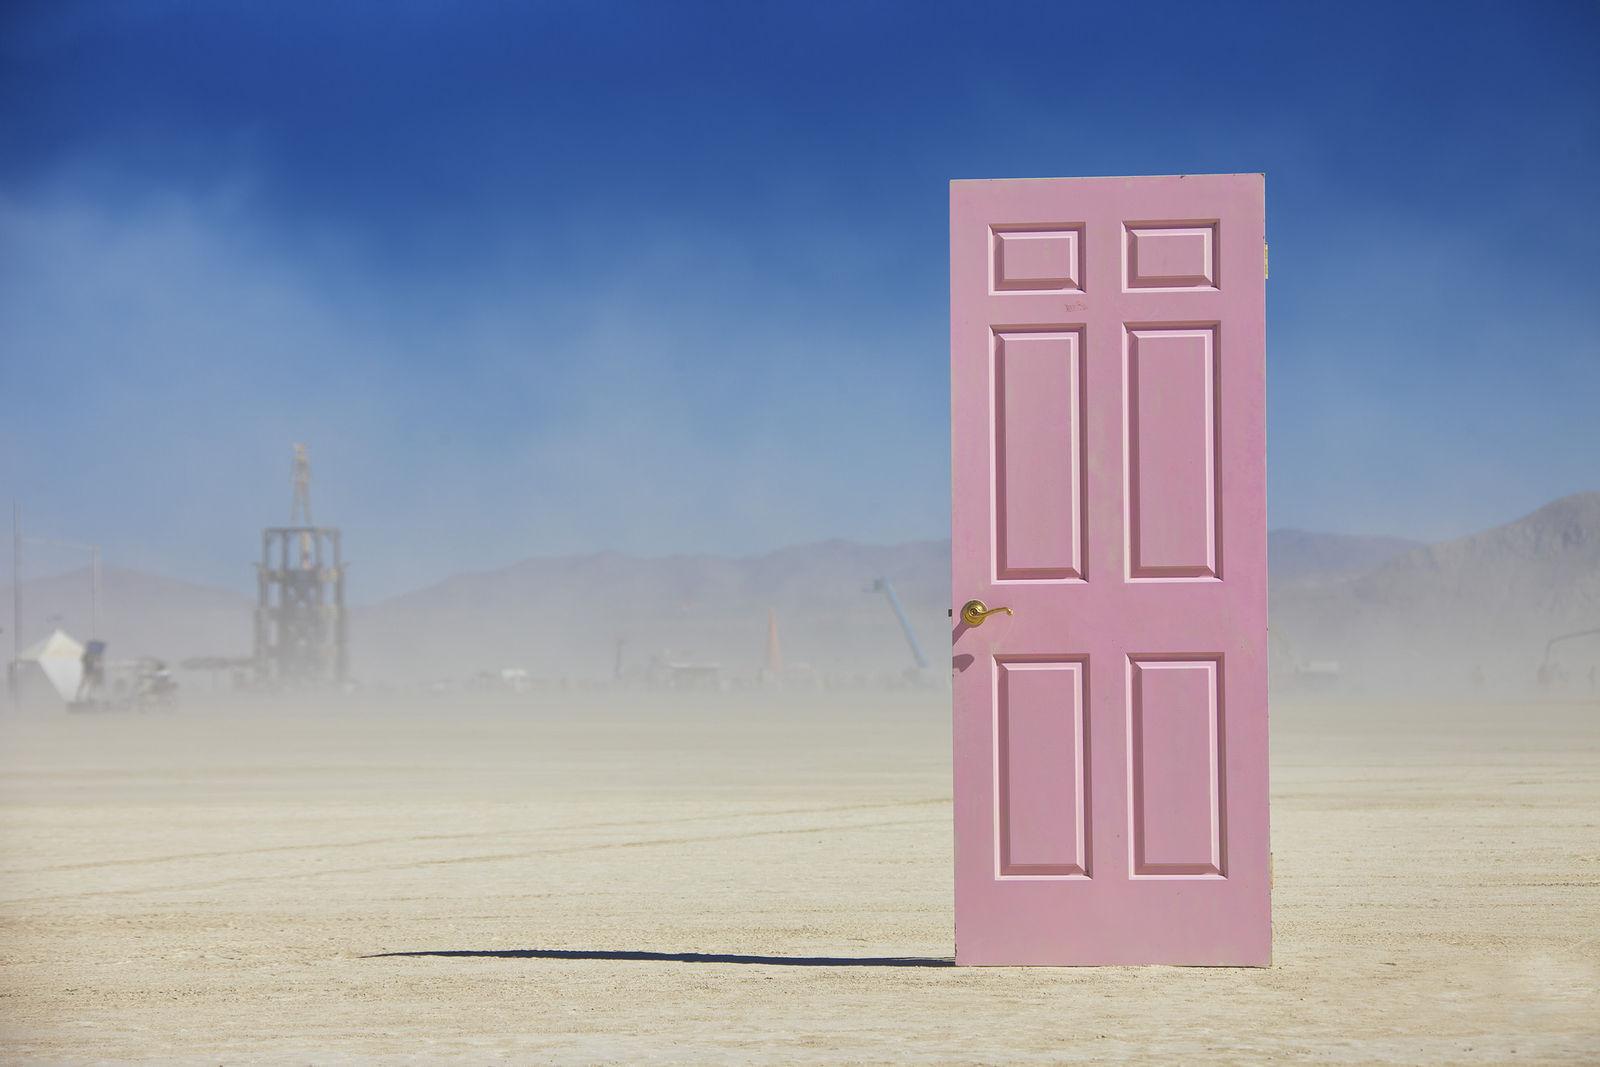 Pavel Antonov. Burning Man. City of Sand. _MG_9663-Edit copy